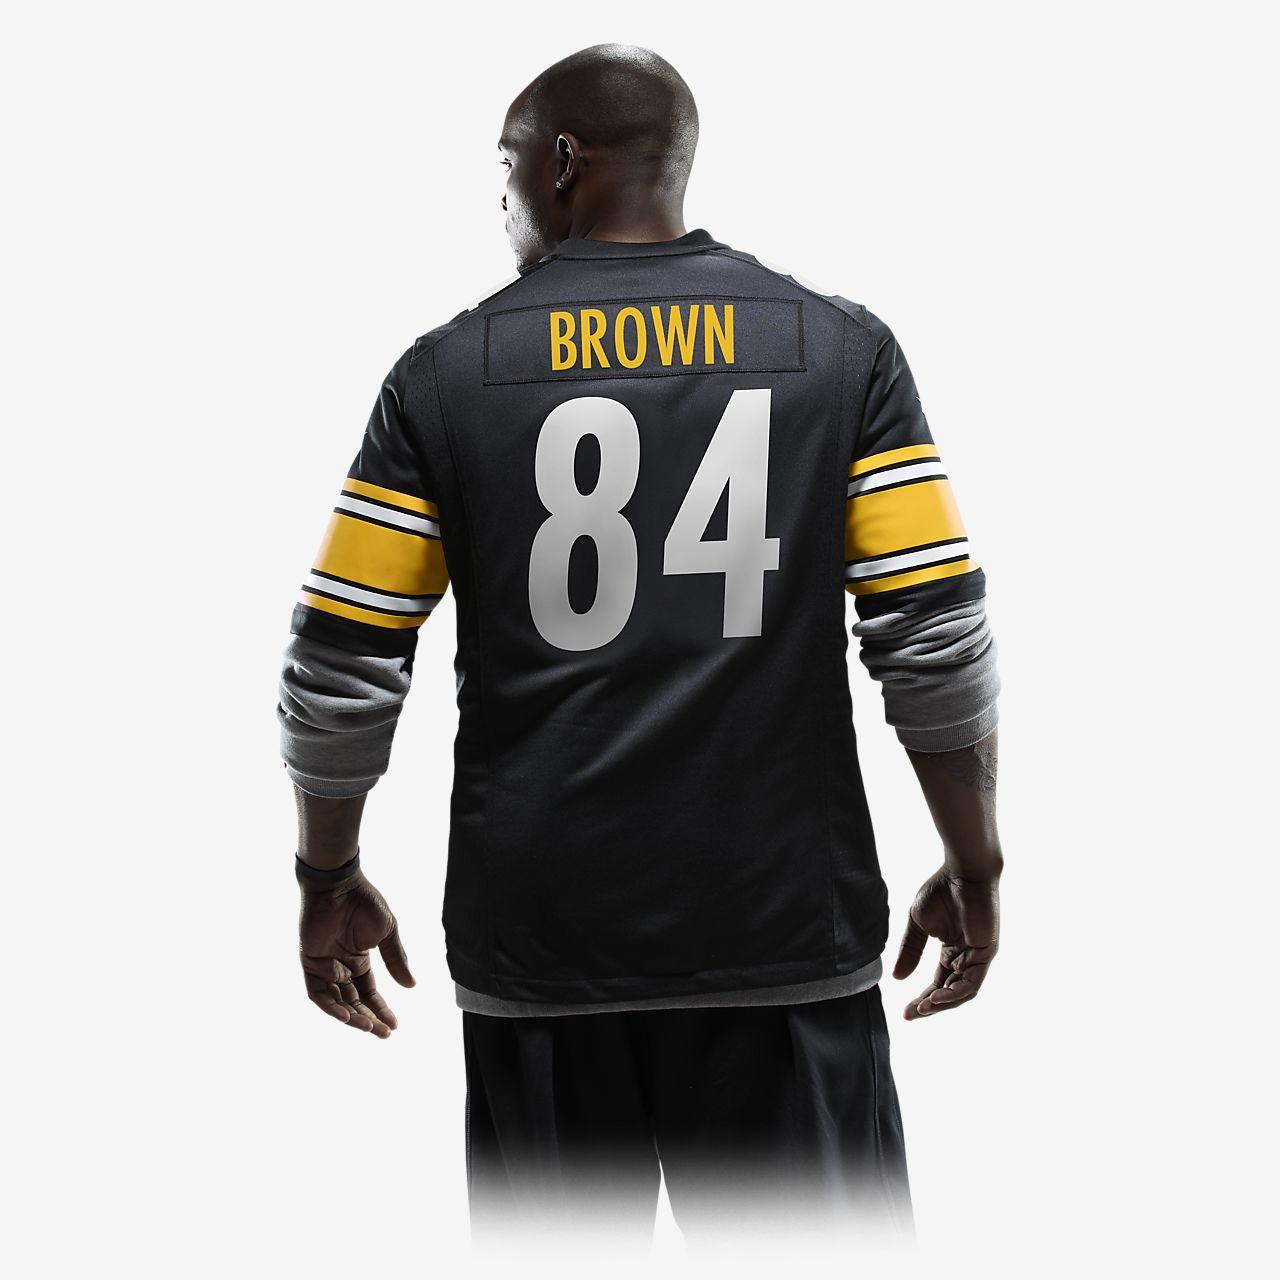 ... NFL Pittsburgh Steelers (Antonio Brown) Men s American Football Home  Game Jersey f41be21ec